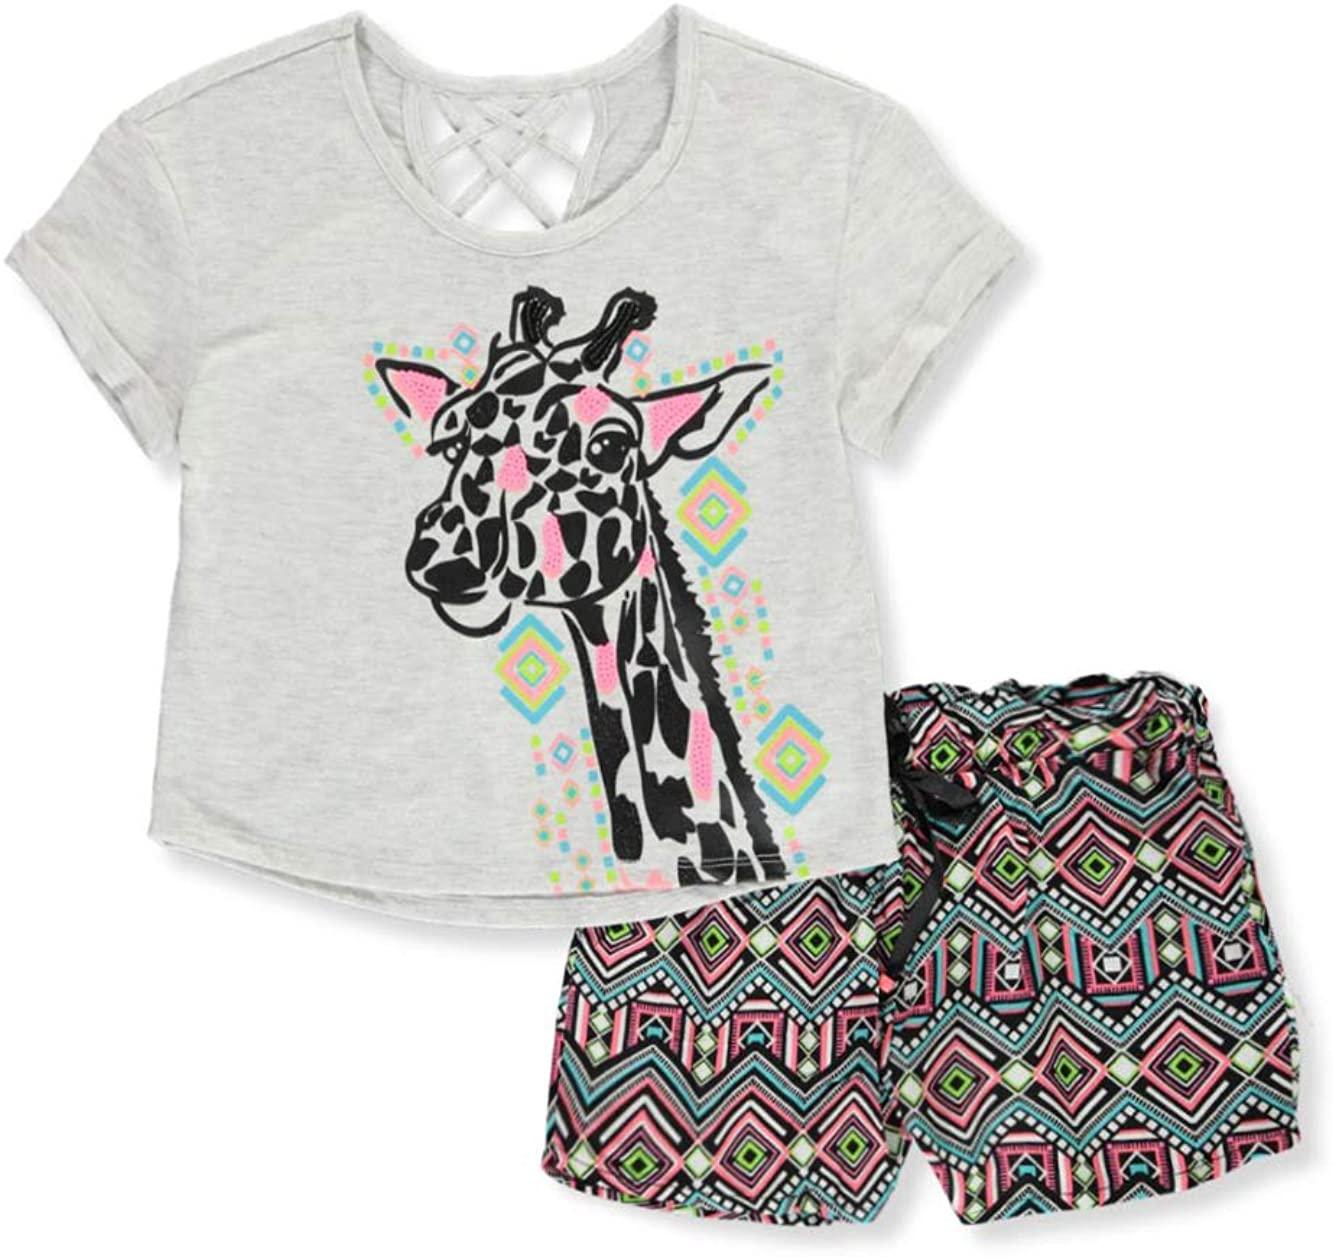 RMLA Girls' Sparkle Giraffe 2-Piece Shorts Set Outfit